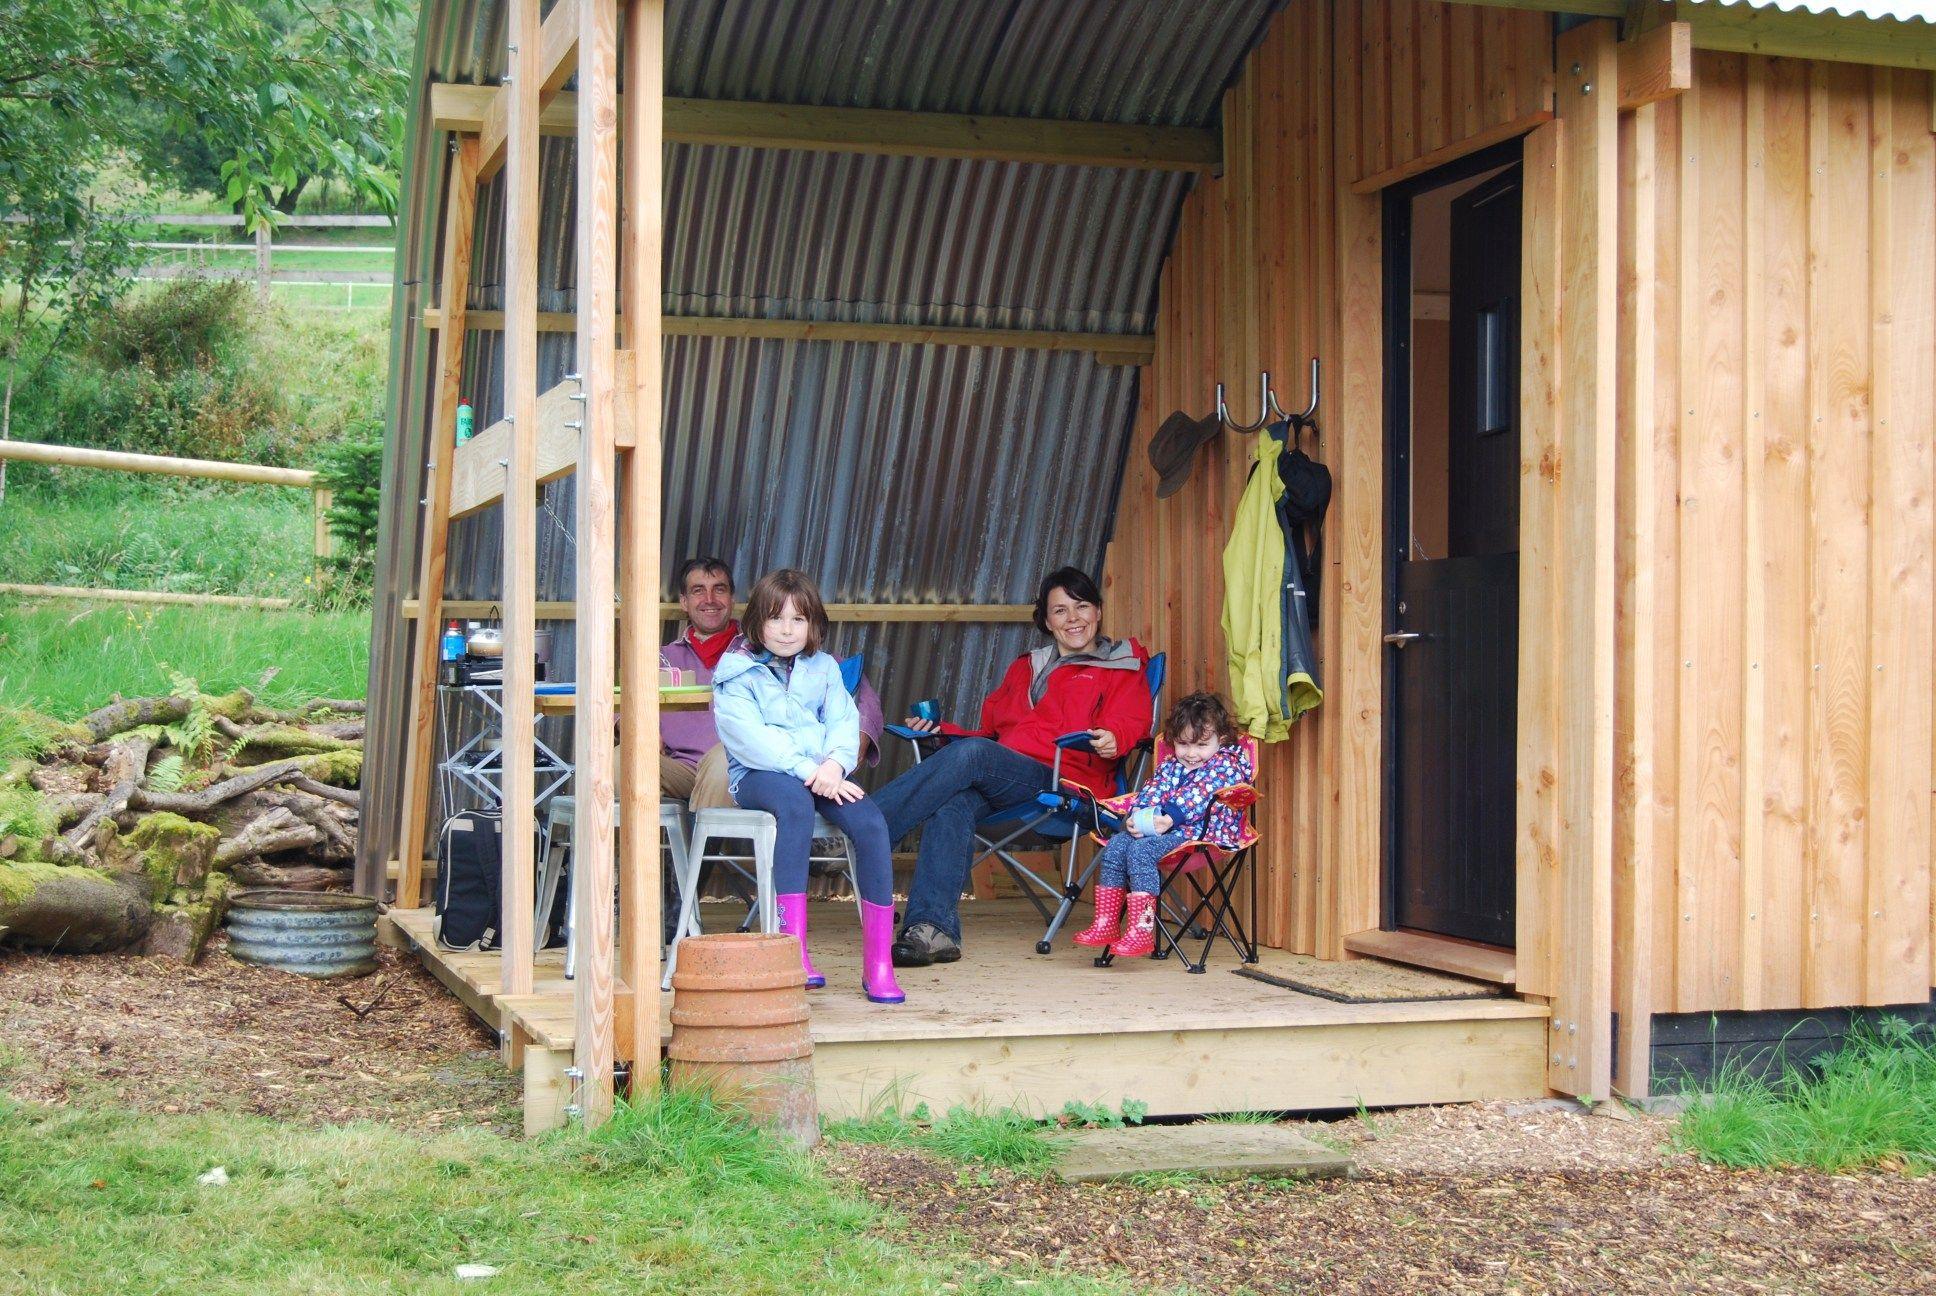 subterranean space garden backyard huts cabins sheds. MorphPOD\u0027s Spacious Veranda Is Big Enough For The Whole Family. Subterranean Space Garden Backyard Huts Cabins Sheds